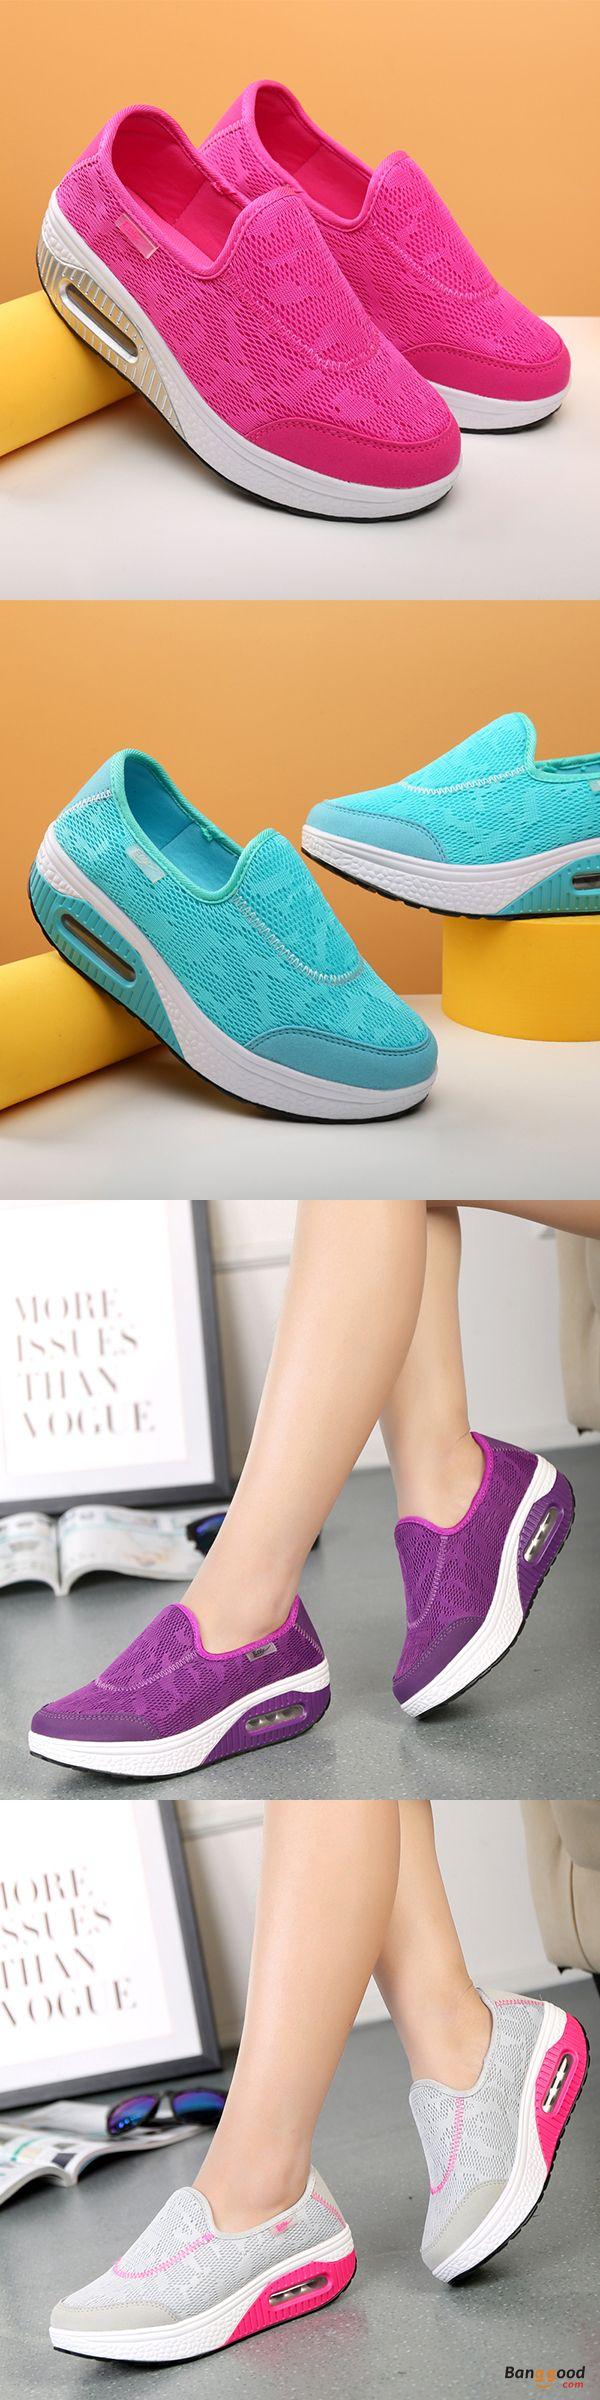 Rocker Sole Shoes Women Slip On Sport Casual Running Canvas Shoes